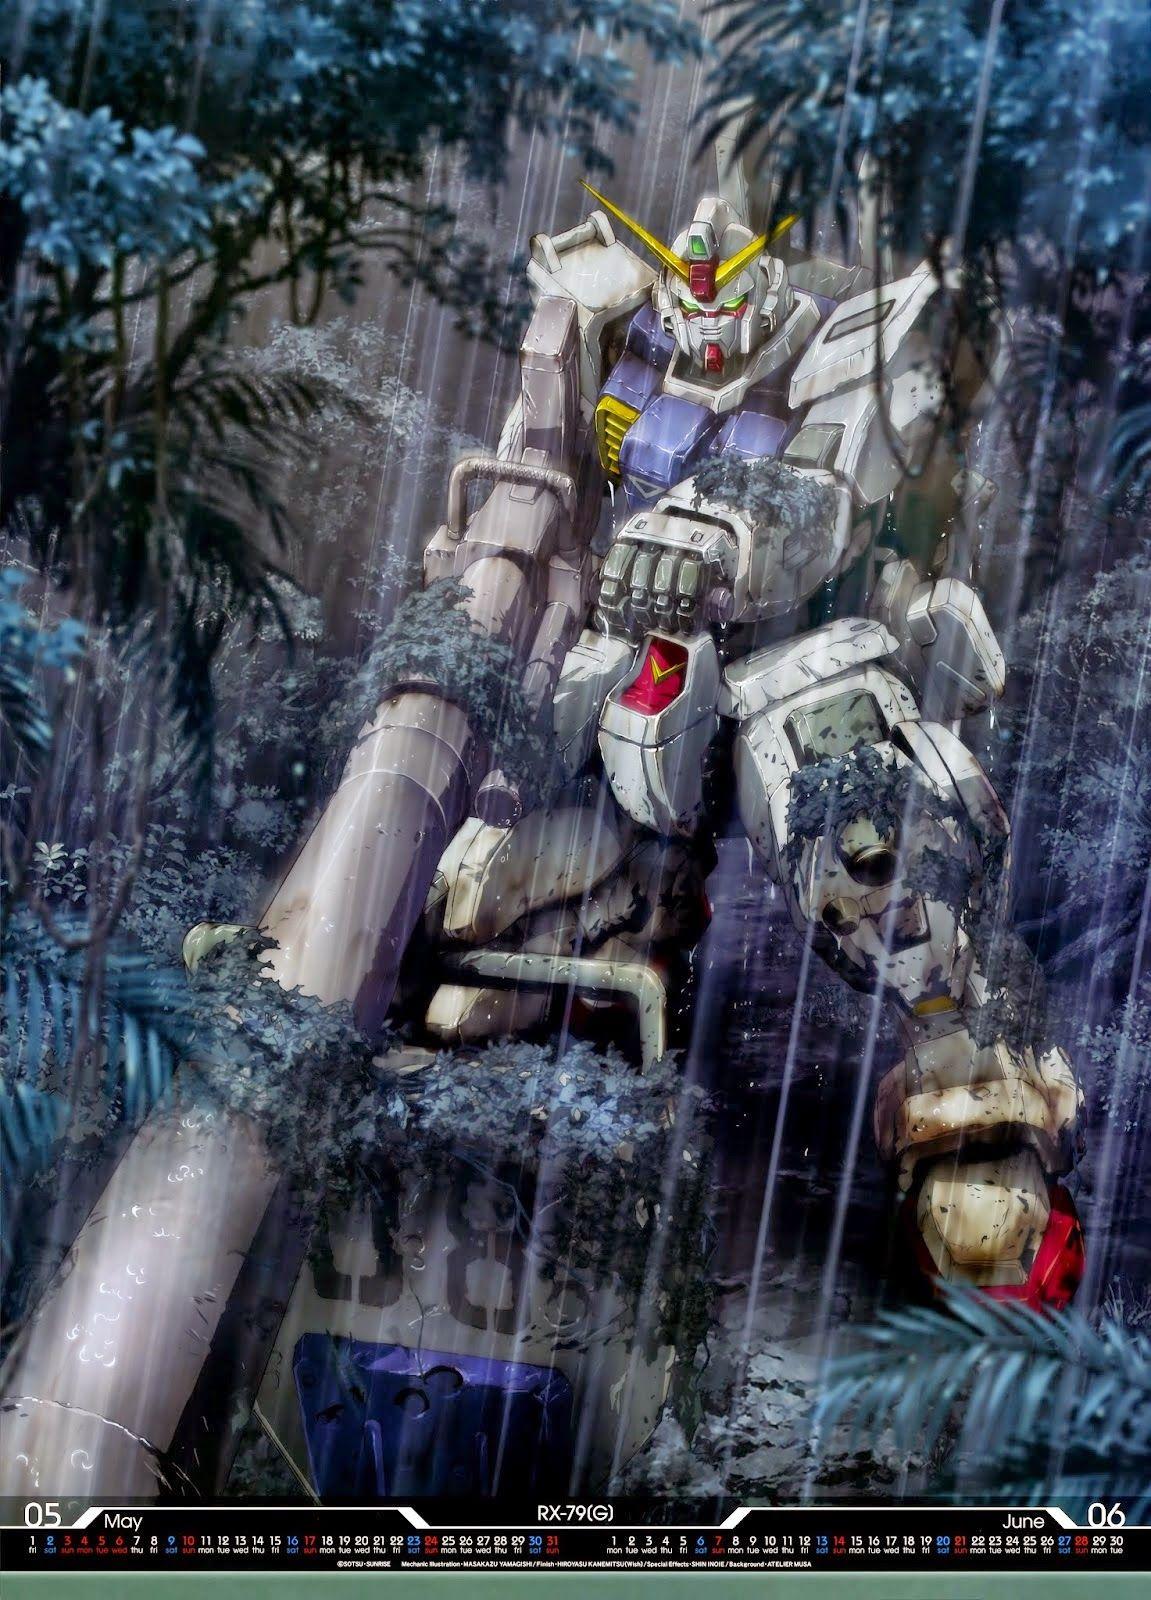 GUNDAM GUY Mobile Suit Gundam 2015 Calender Image